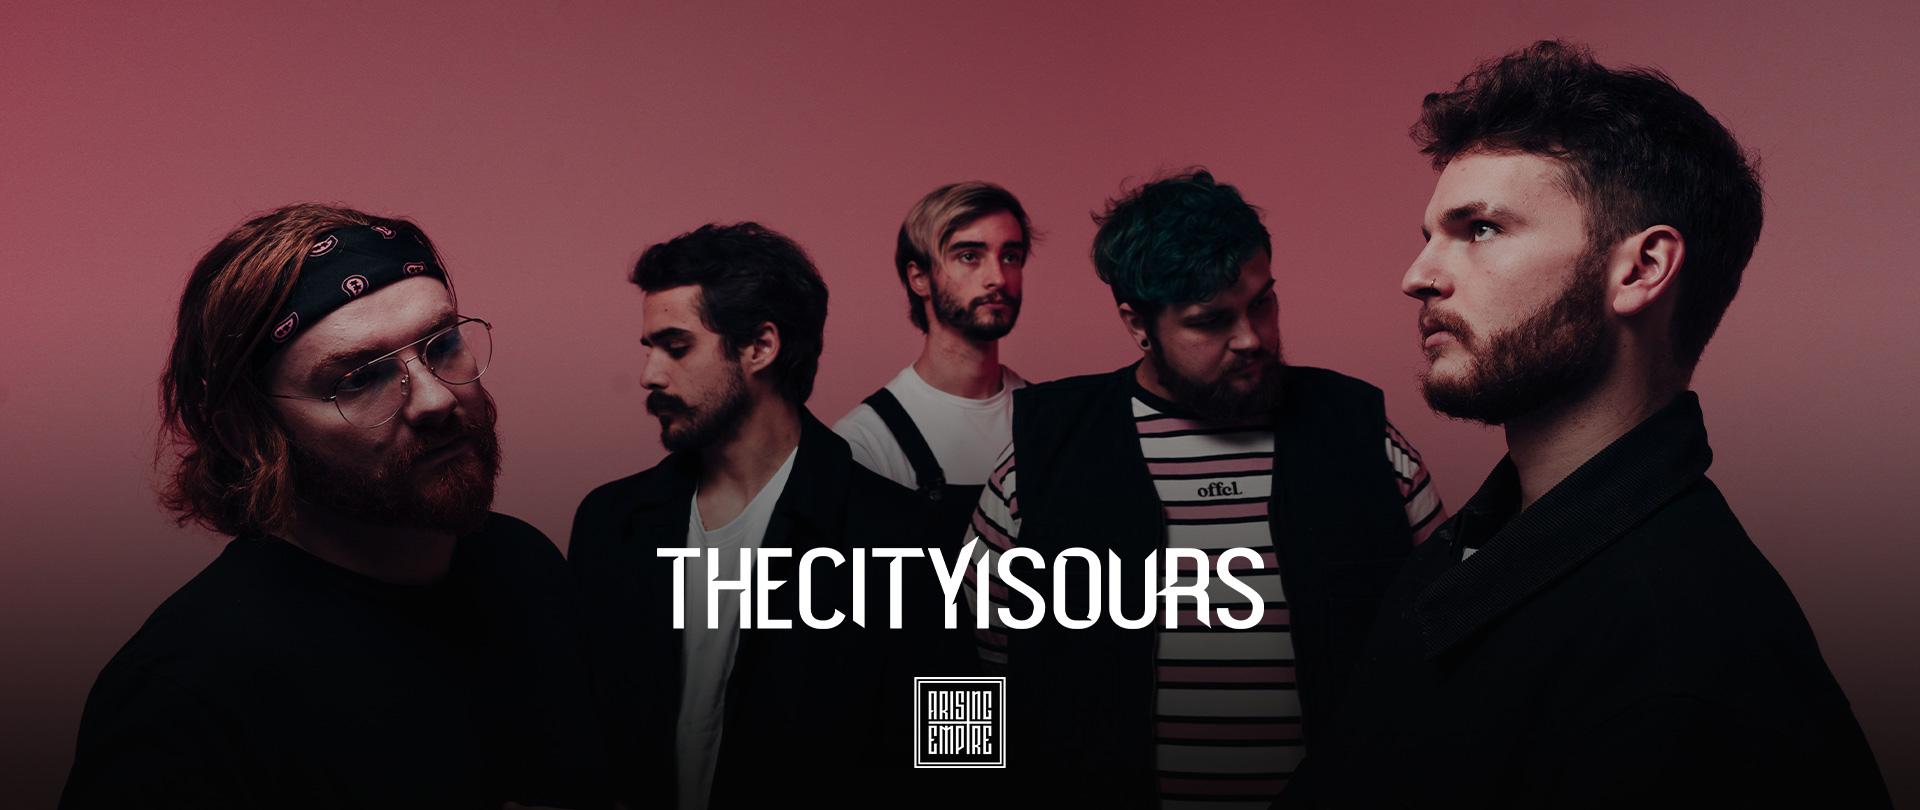 TheCityIsOurs at Arising Empire • Offizieller Online Shop